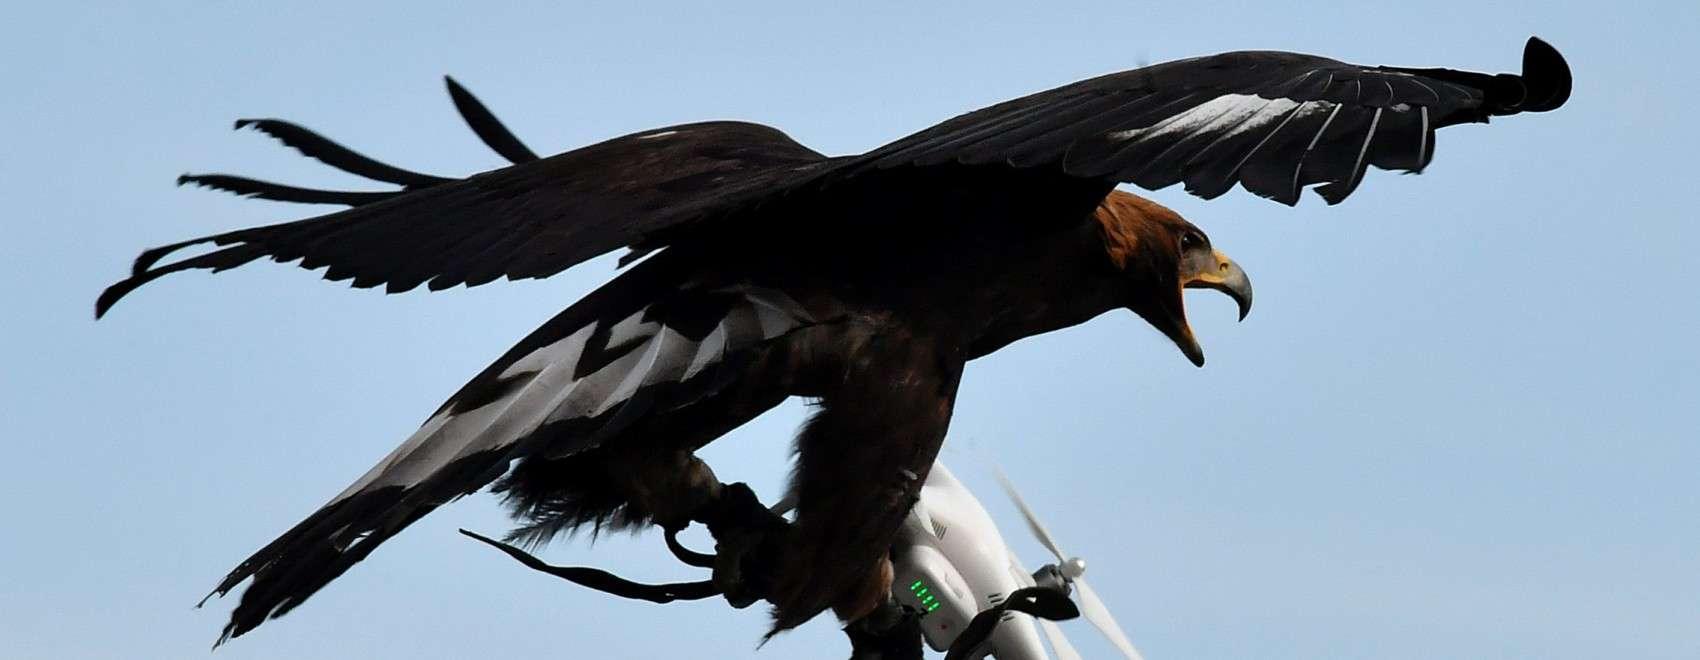 drone mitigation solutions eagle capture